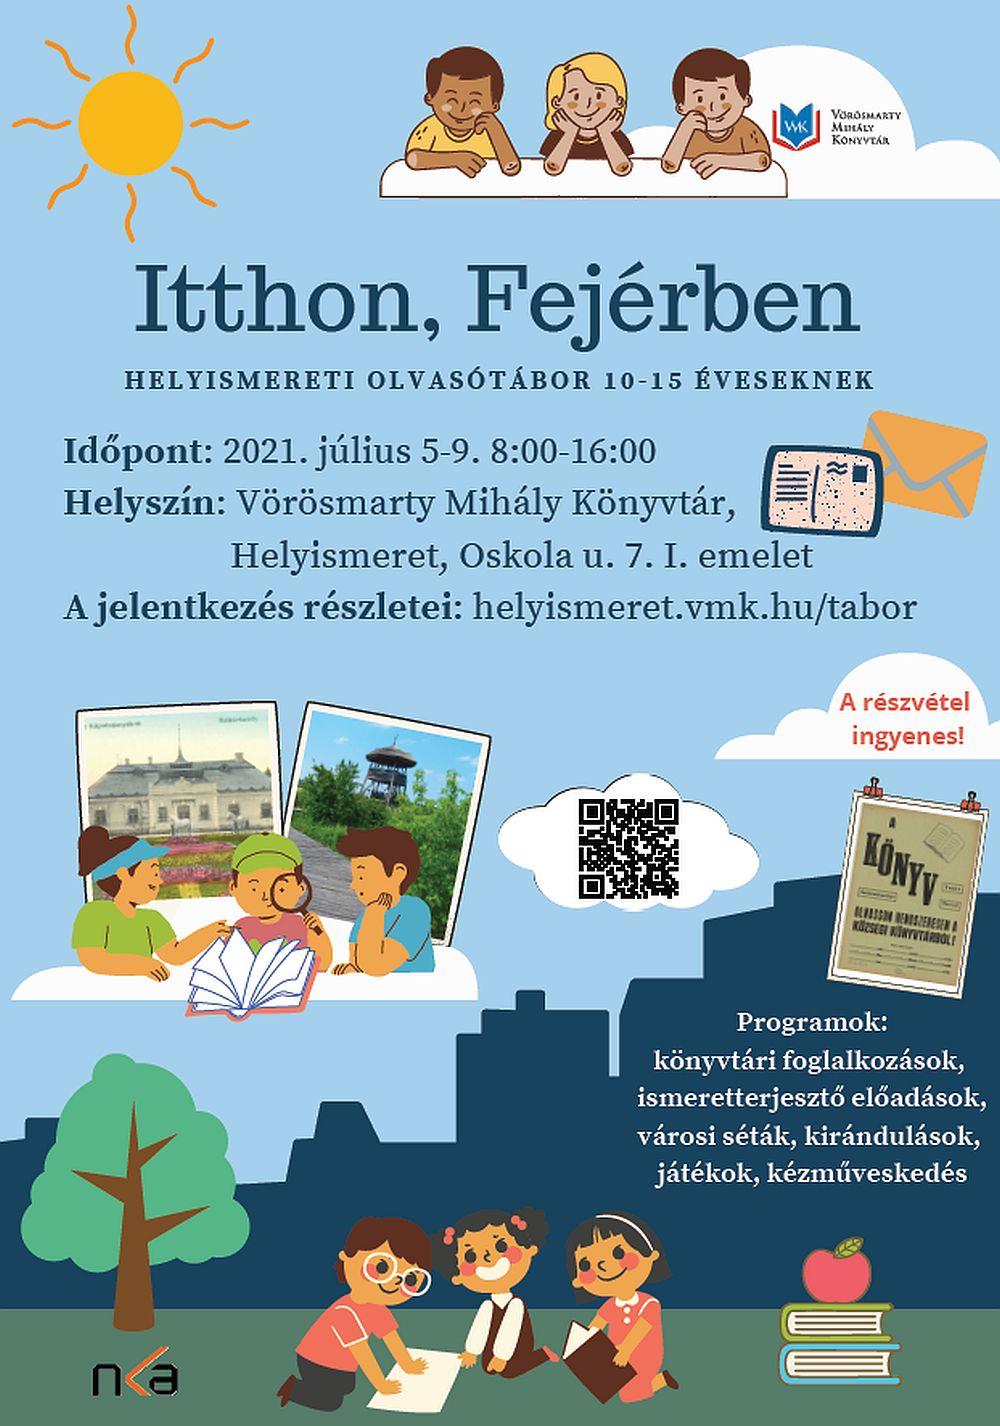 Székesfehérvár City Gate - Local Knowledge Camp for Seniors in early July